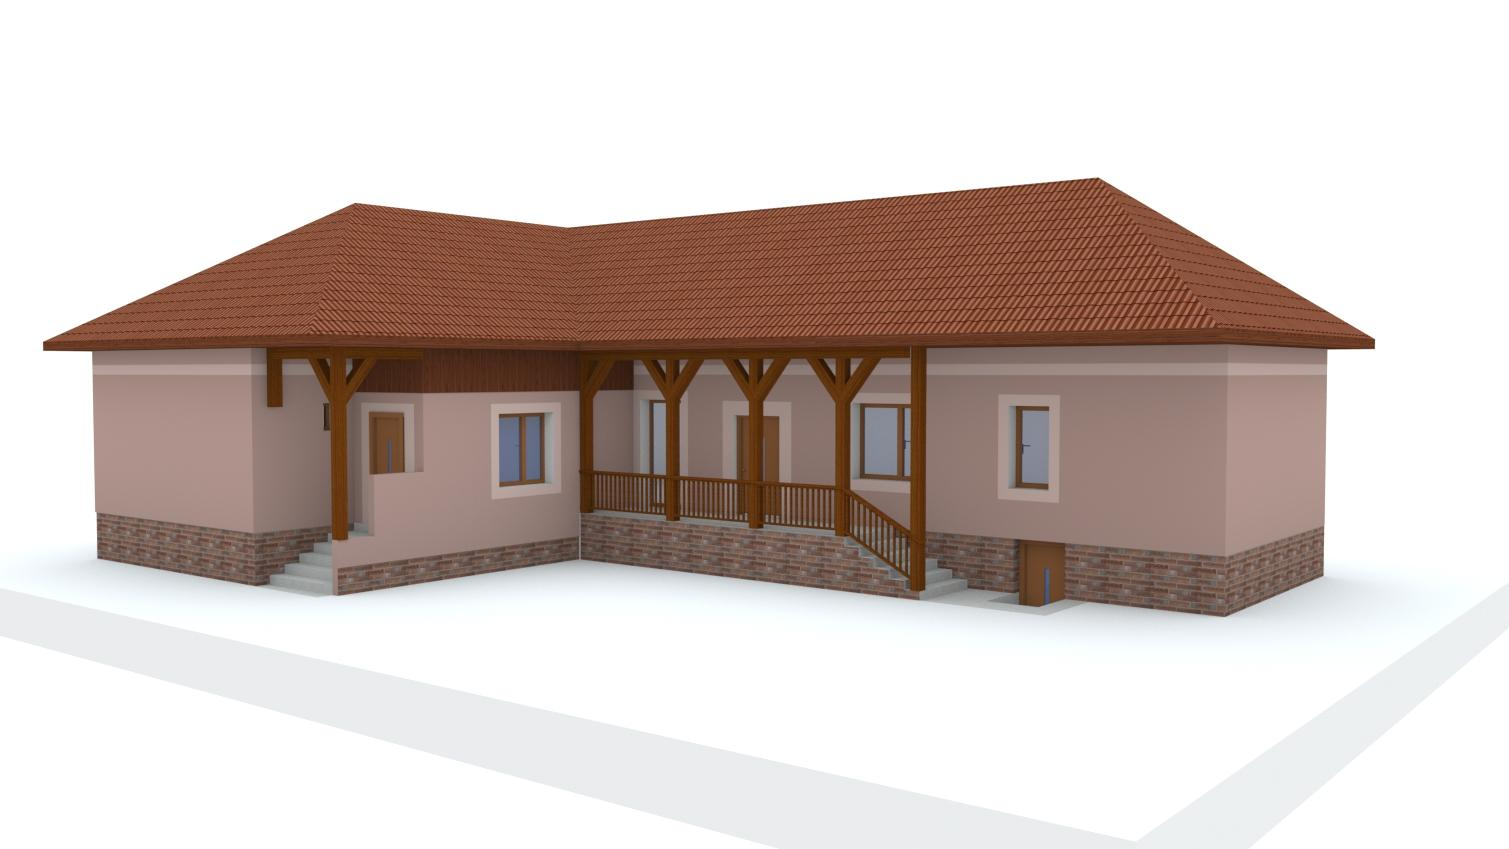 Návrh fasády rodinného domu - Obrázok č. 22